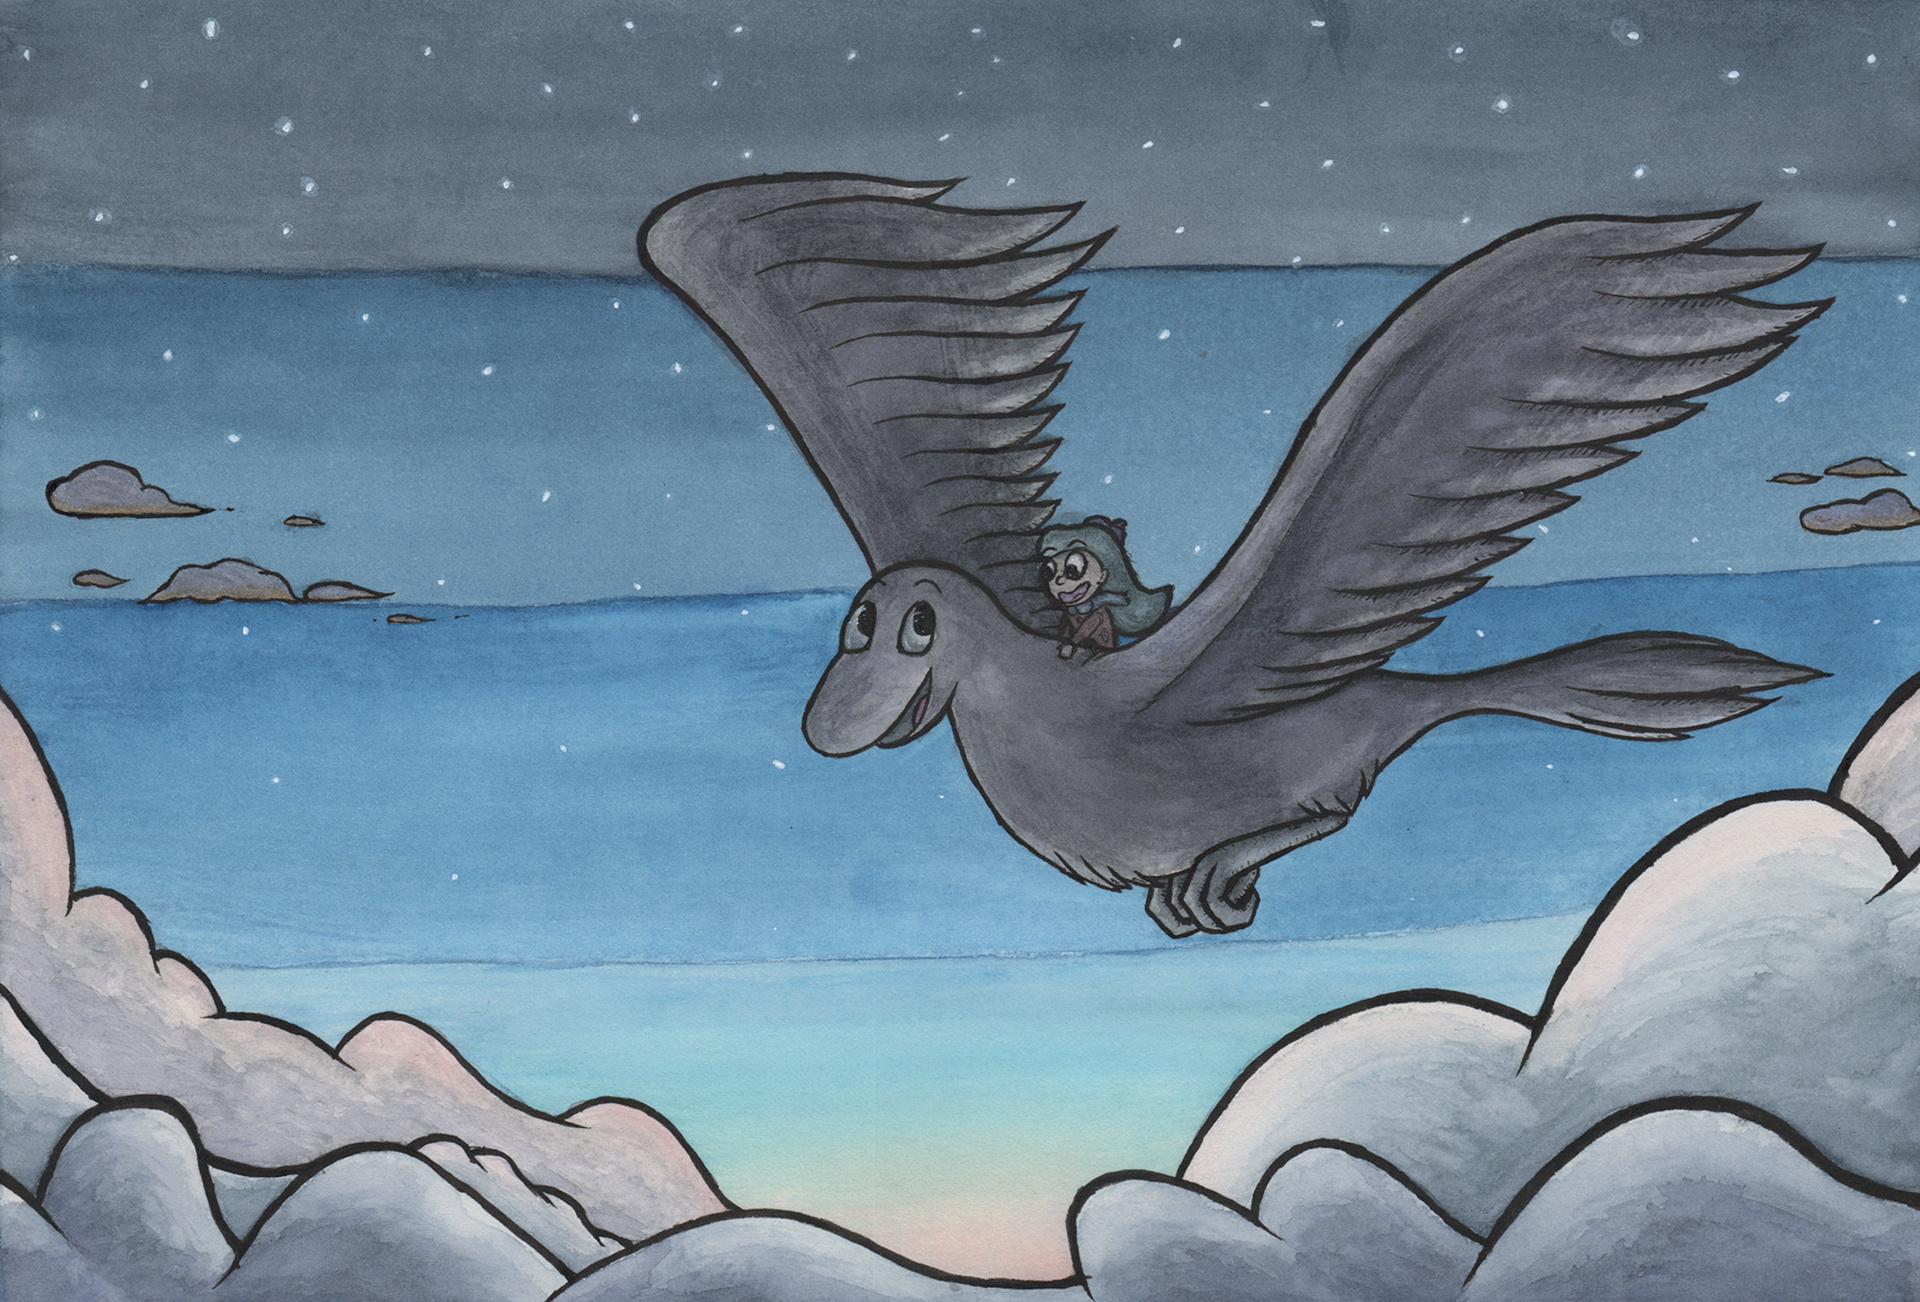 Hilda And The Big Bird